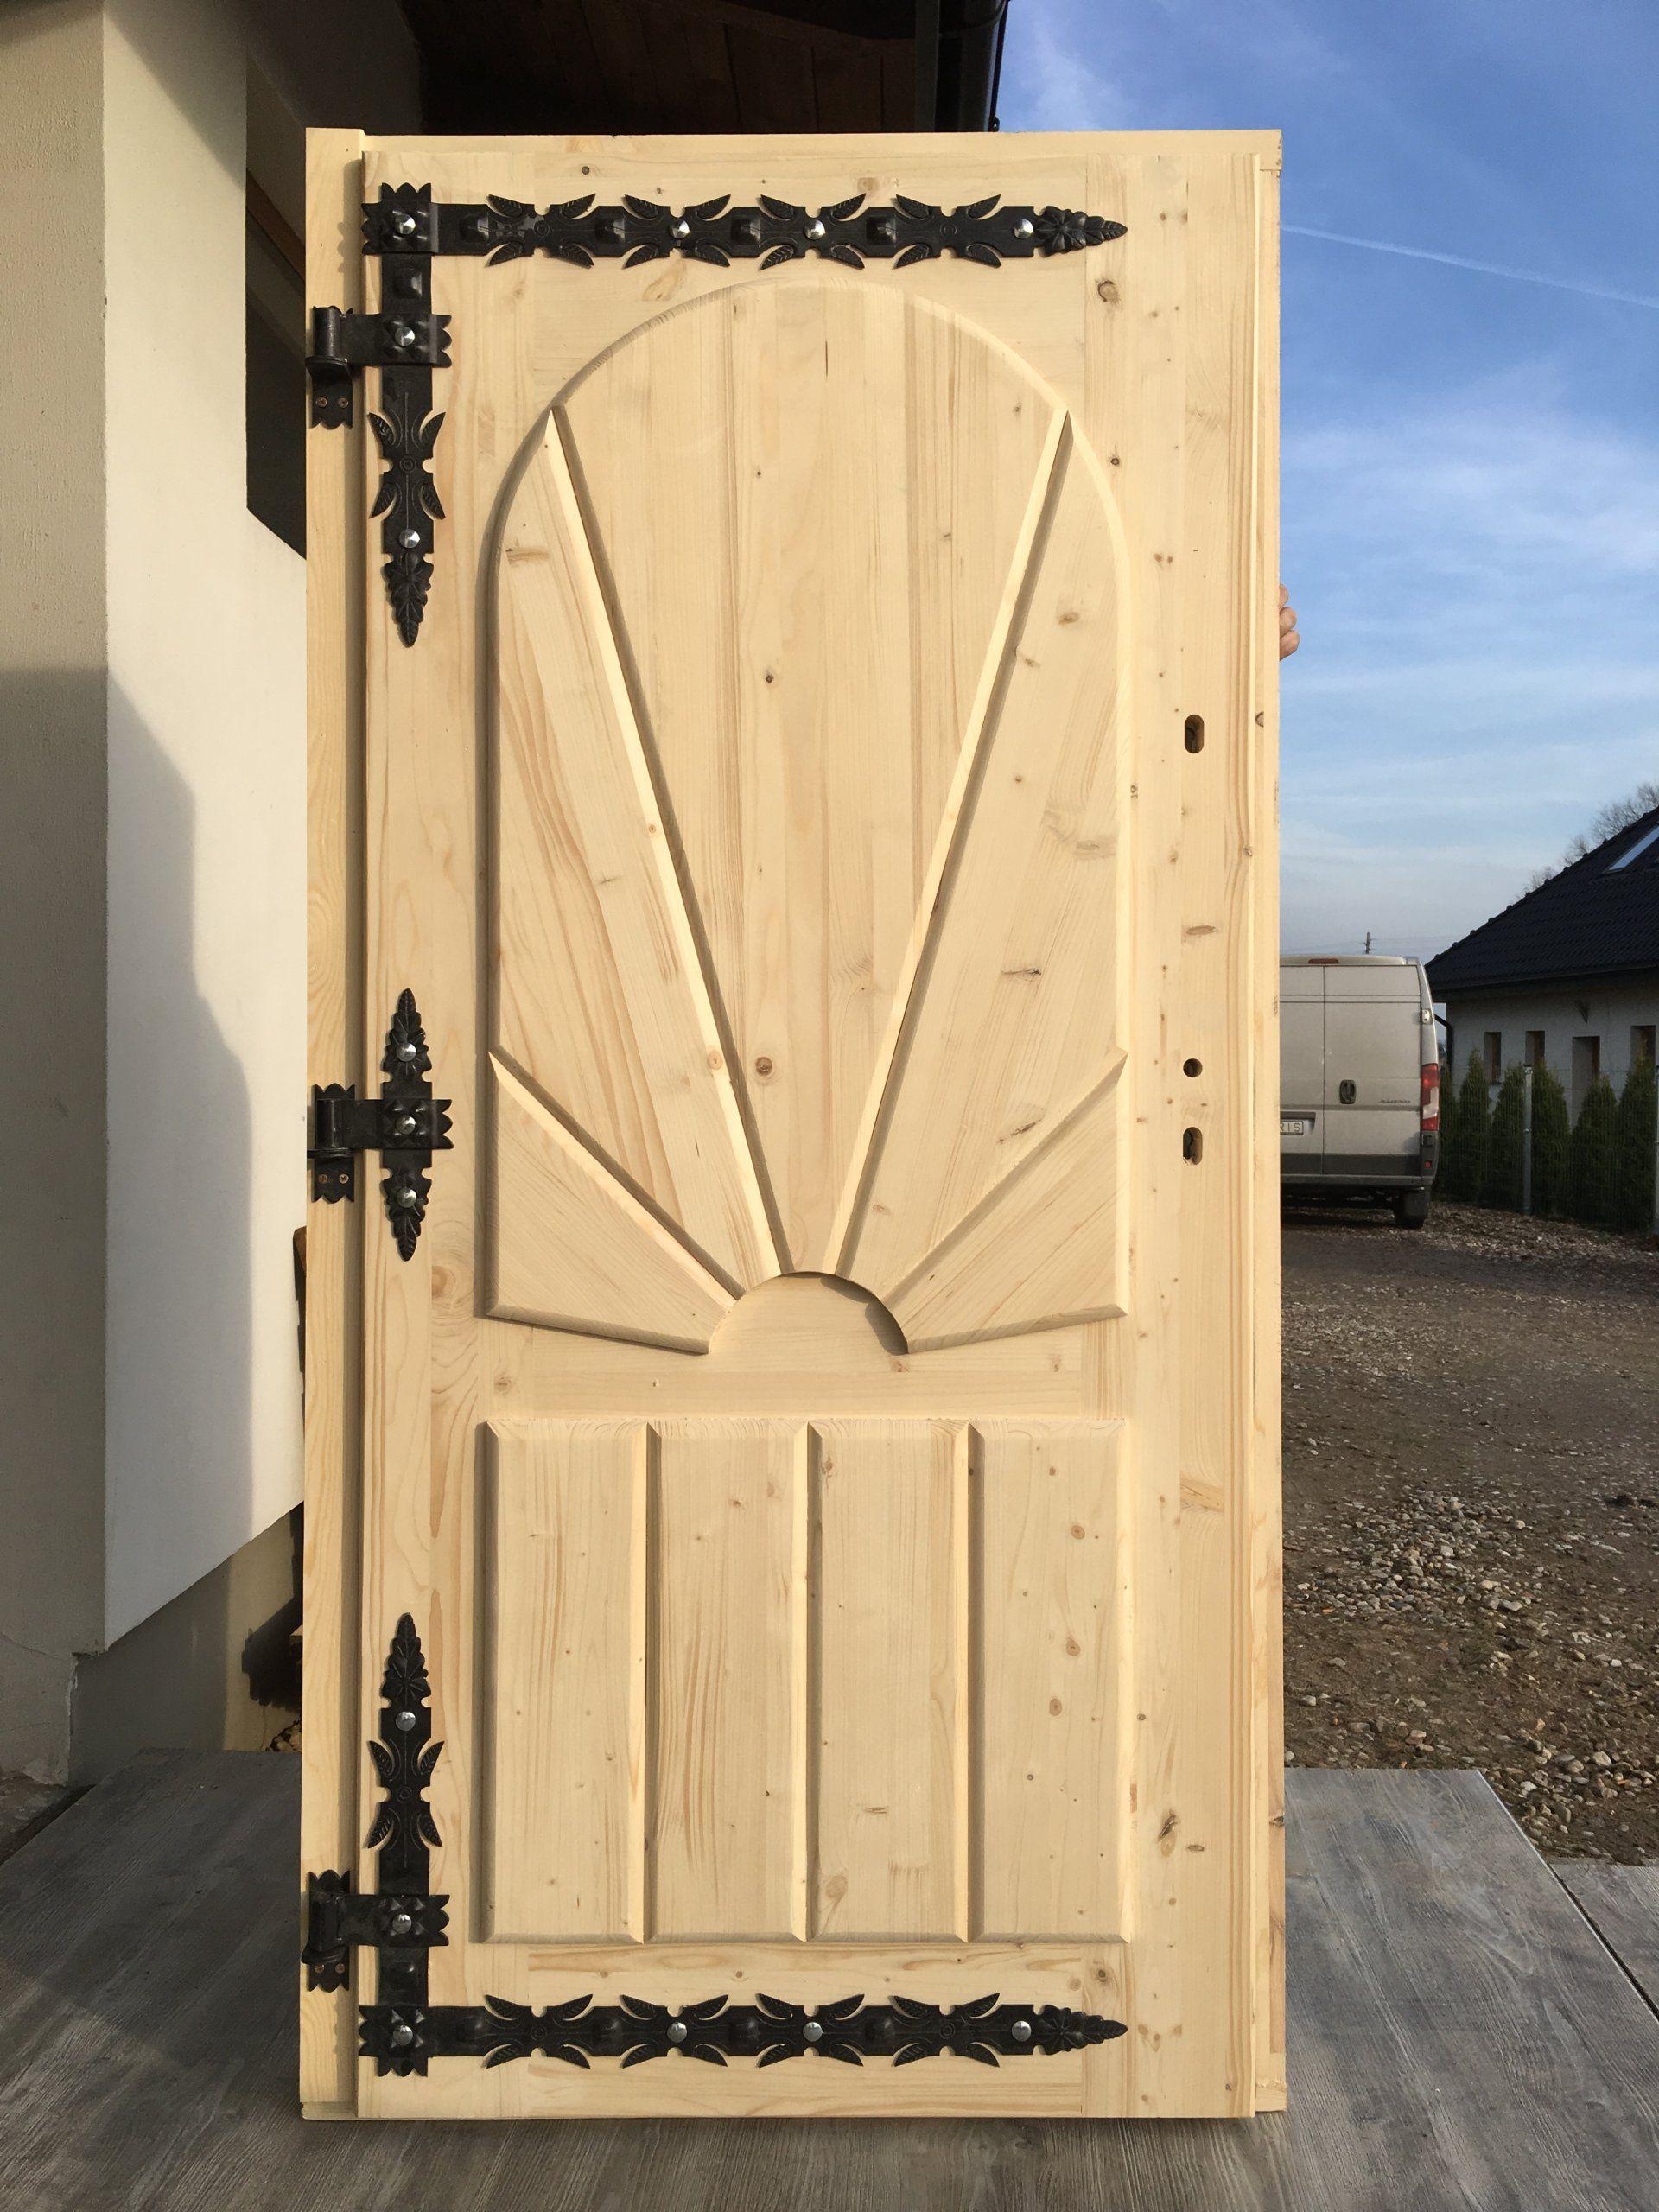 Drzwi Drewniane Zewnetrzne Goralskie Swierkowe 7 5 7078437690 Oficjalne Archiwum Allegro Wooden Doors Rustic Bedroom Furniture Furniture Design Modern